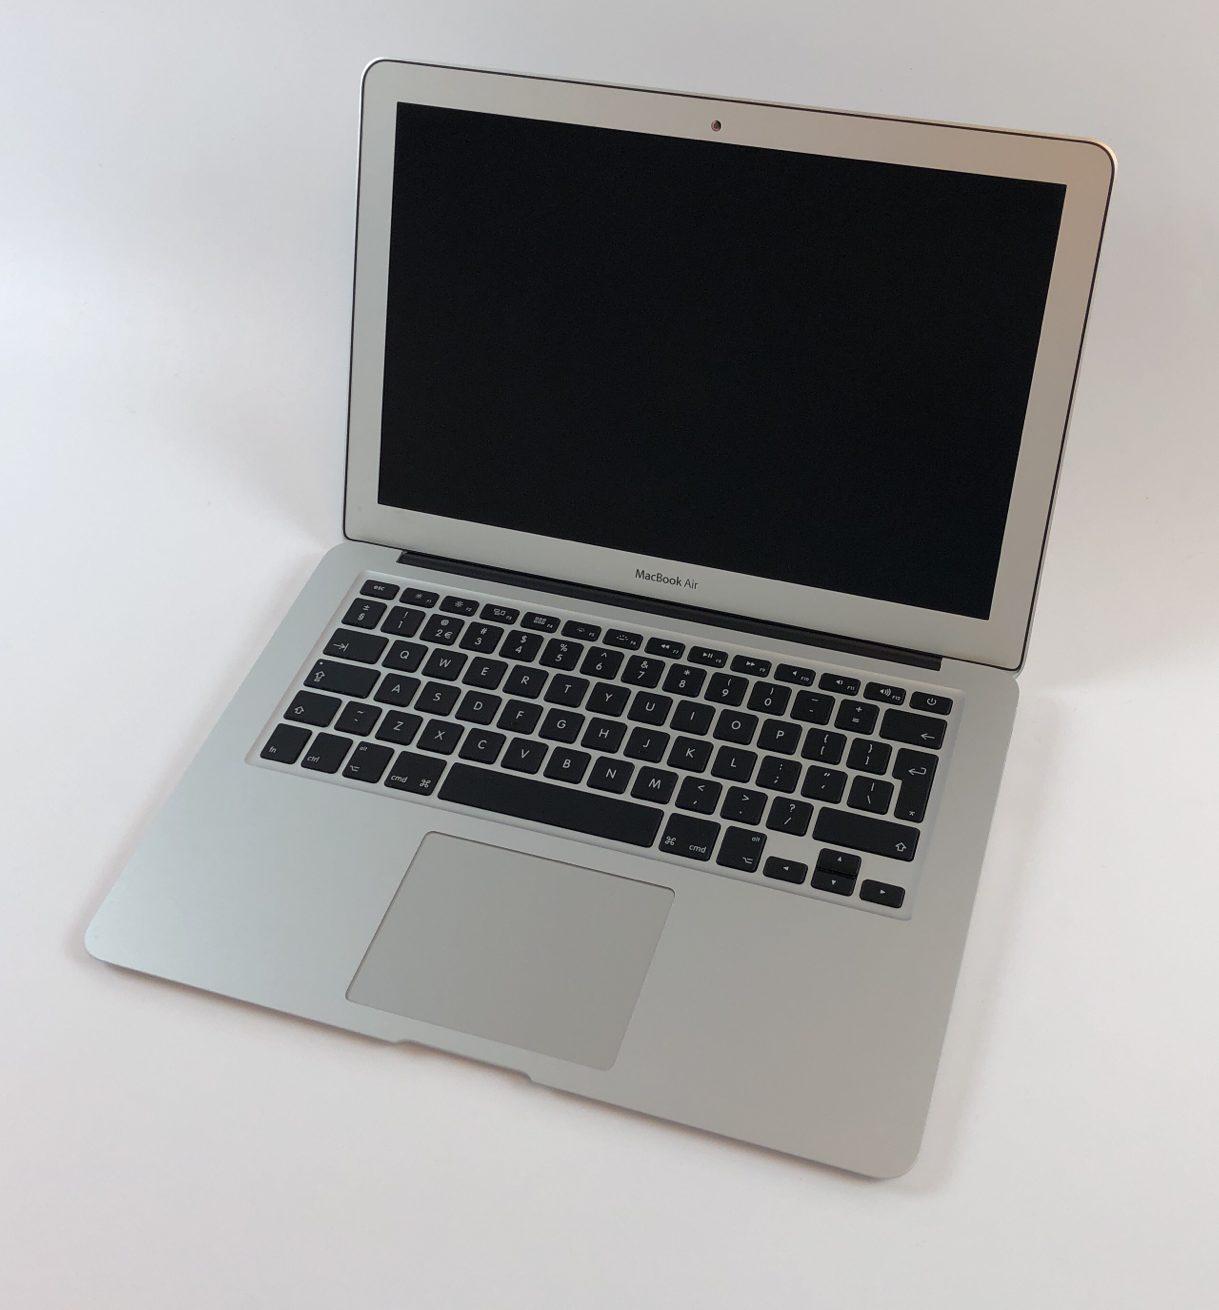 "MacBook Air 13"" Early 2014 (Intel Core i5 1.4 GHz 4 GB RAM 512 GB SSD), Intel Core i5 1.4 GHz, 4 GB RAM, 512 GB SSD, Afbeelding 1"